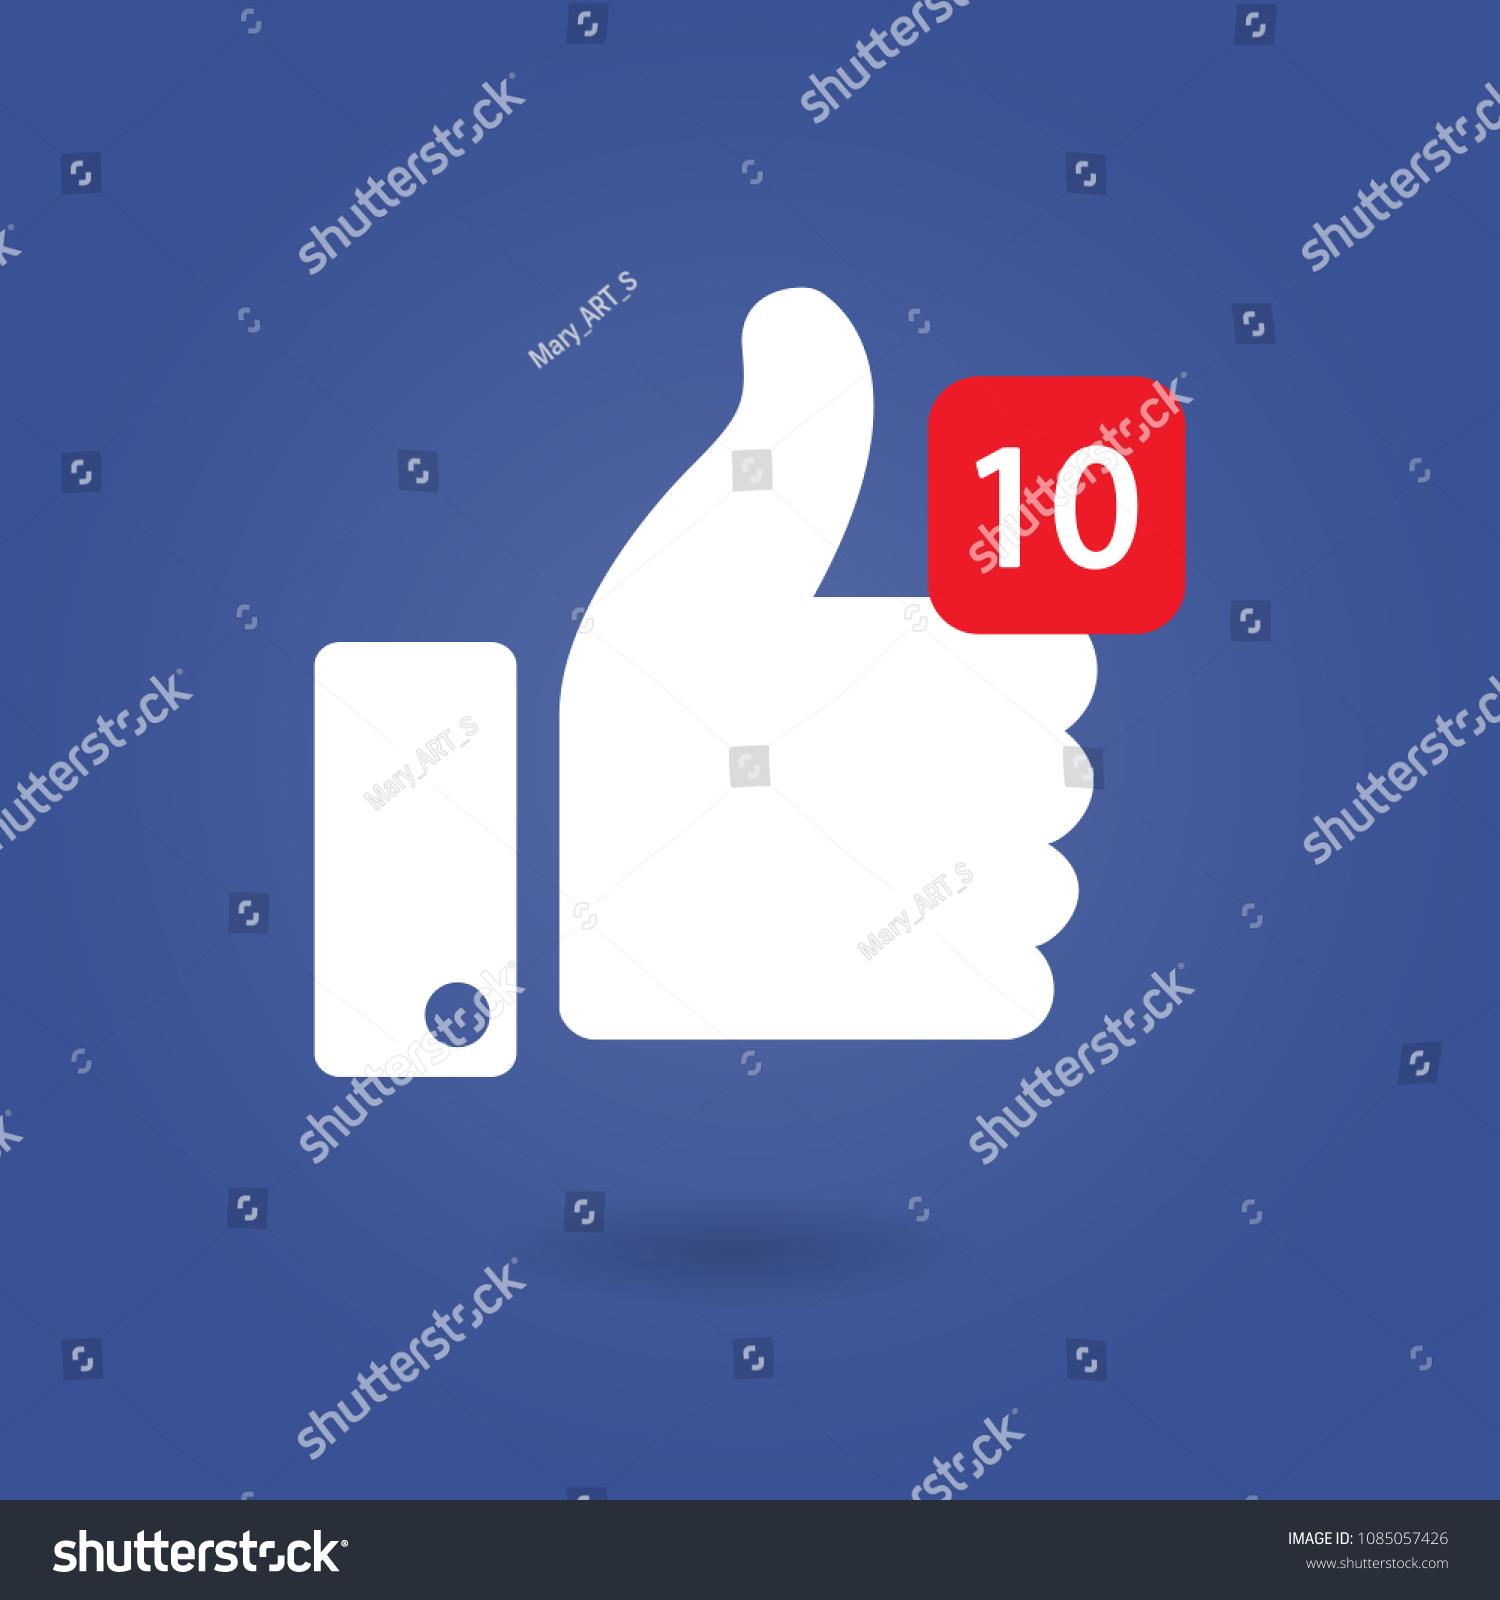 Thumbs 10 Like Social Network Facebook Stock Vector Royalty Free